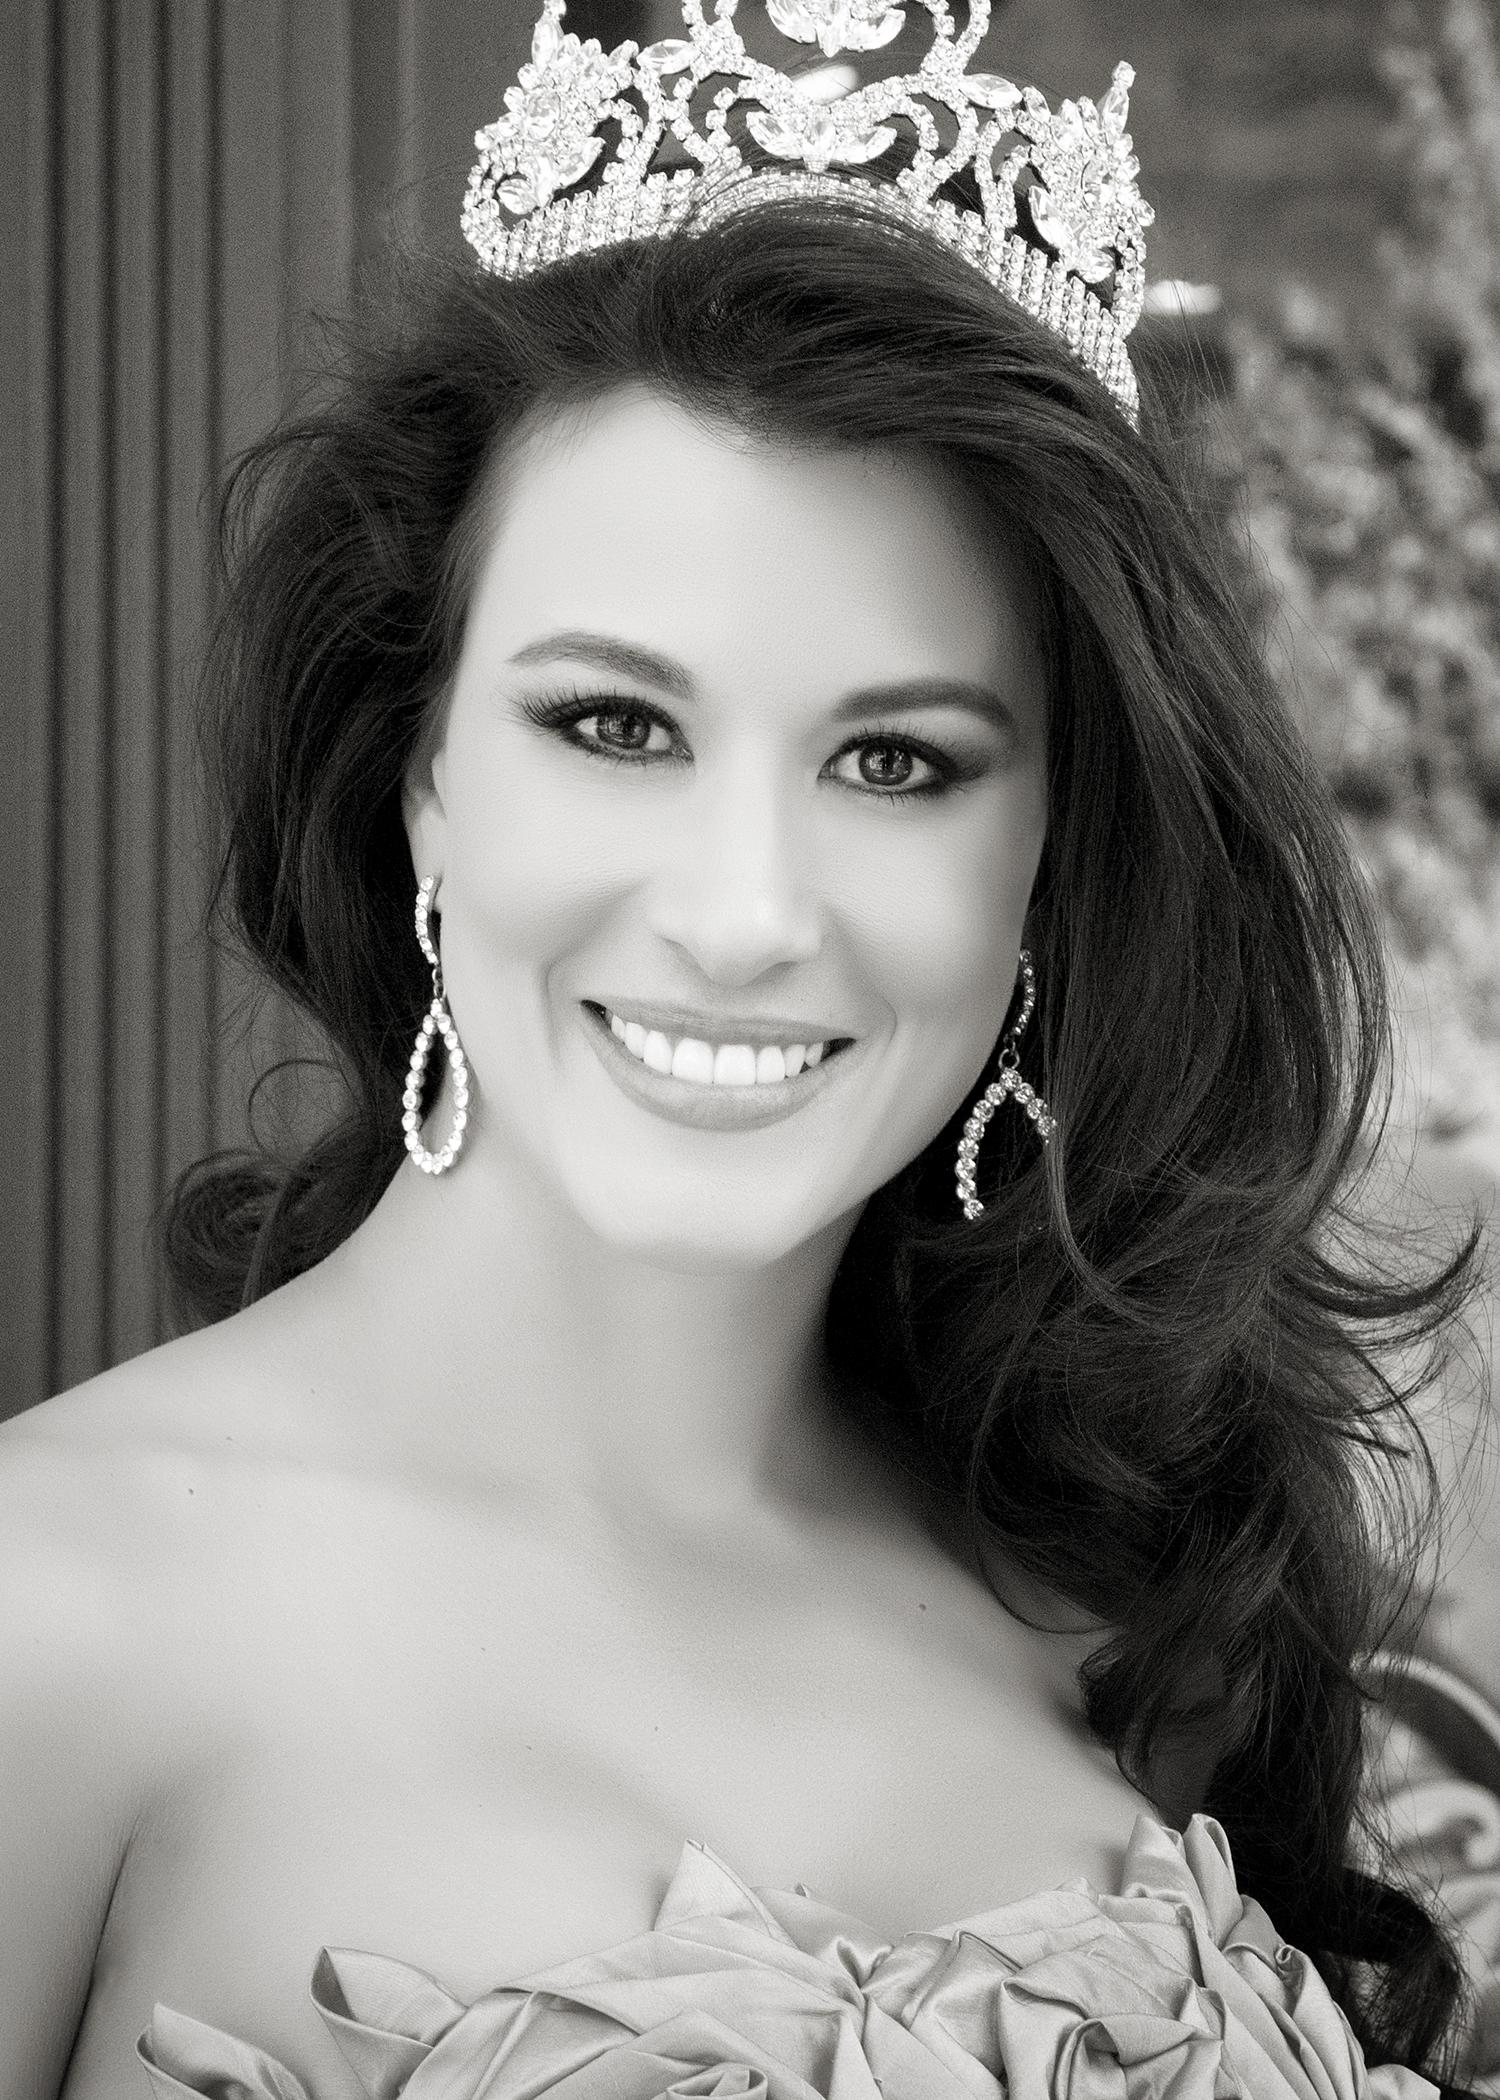 Mrs. Colorado America 2010